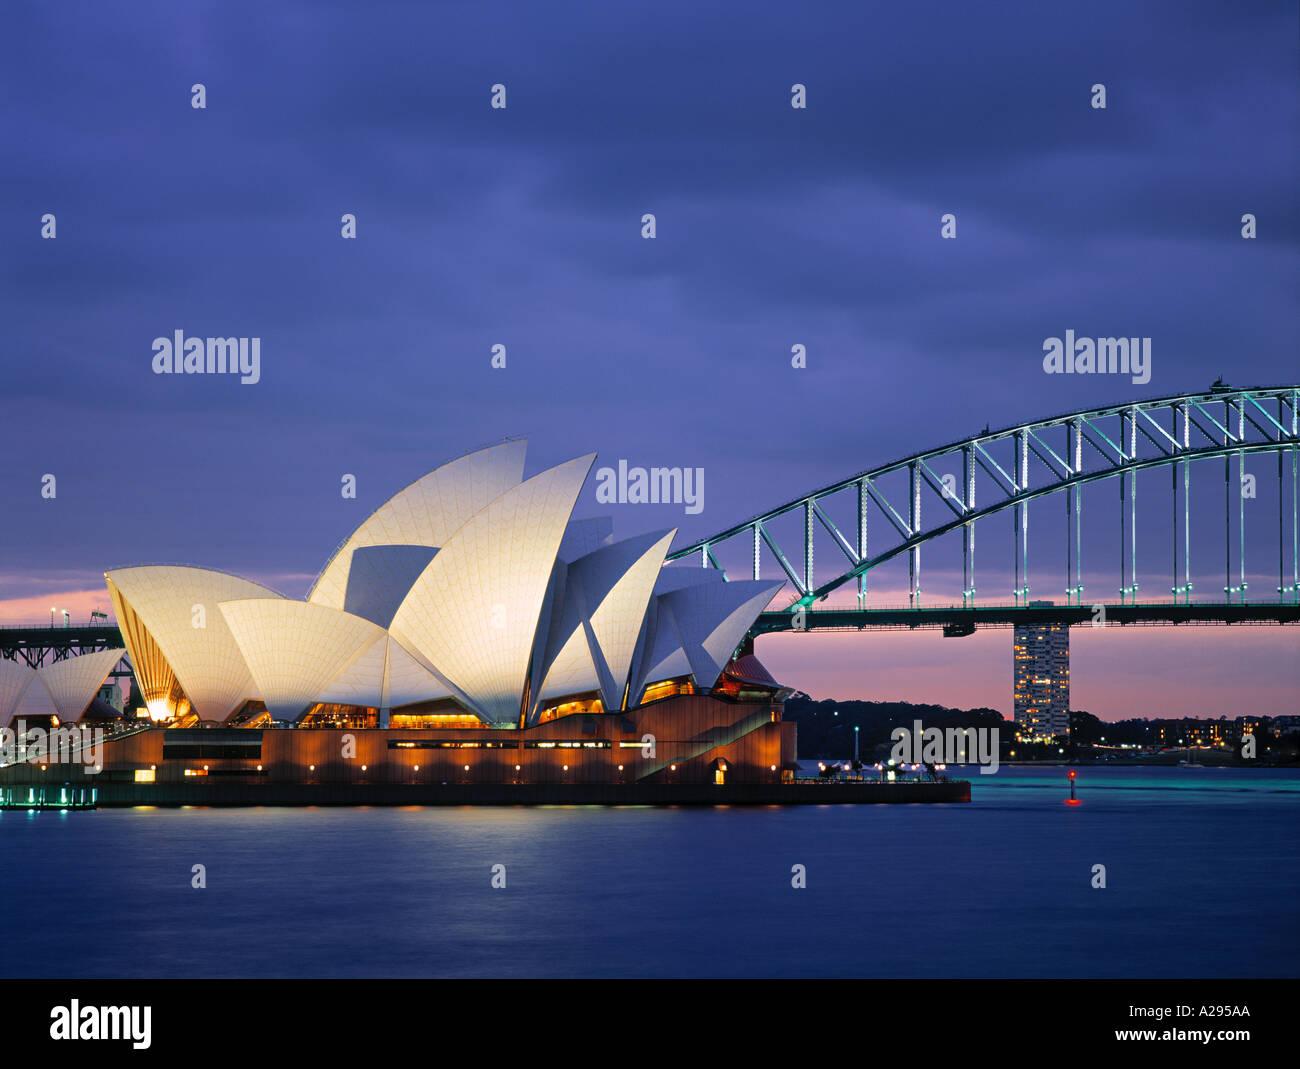 Opera House, Sydney, NSW, Australia - Stock Image